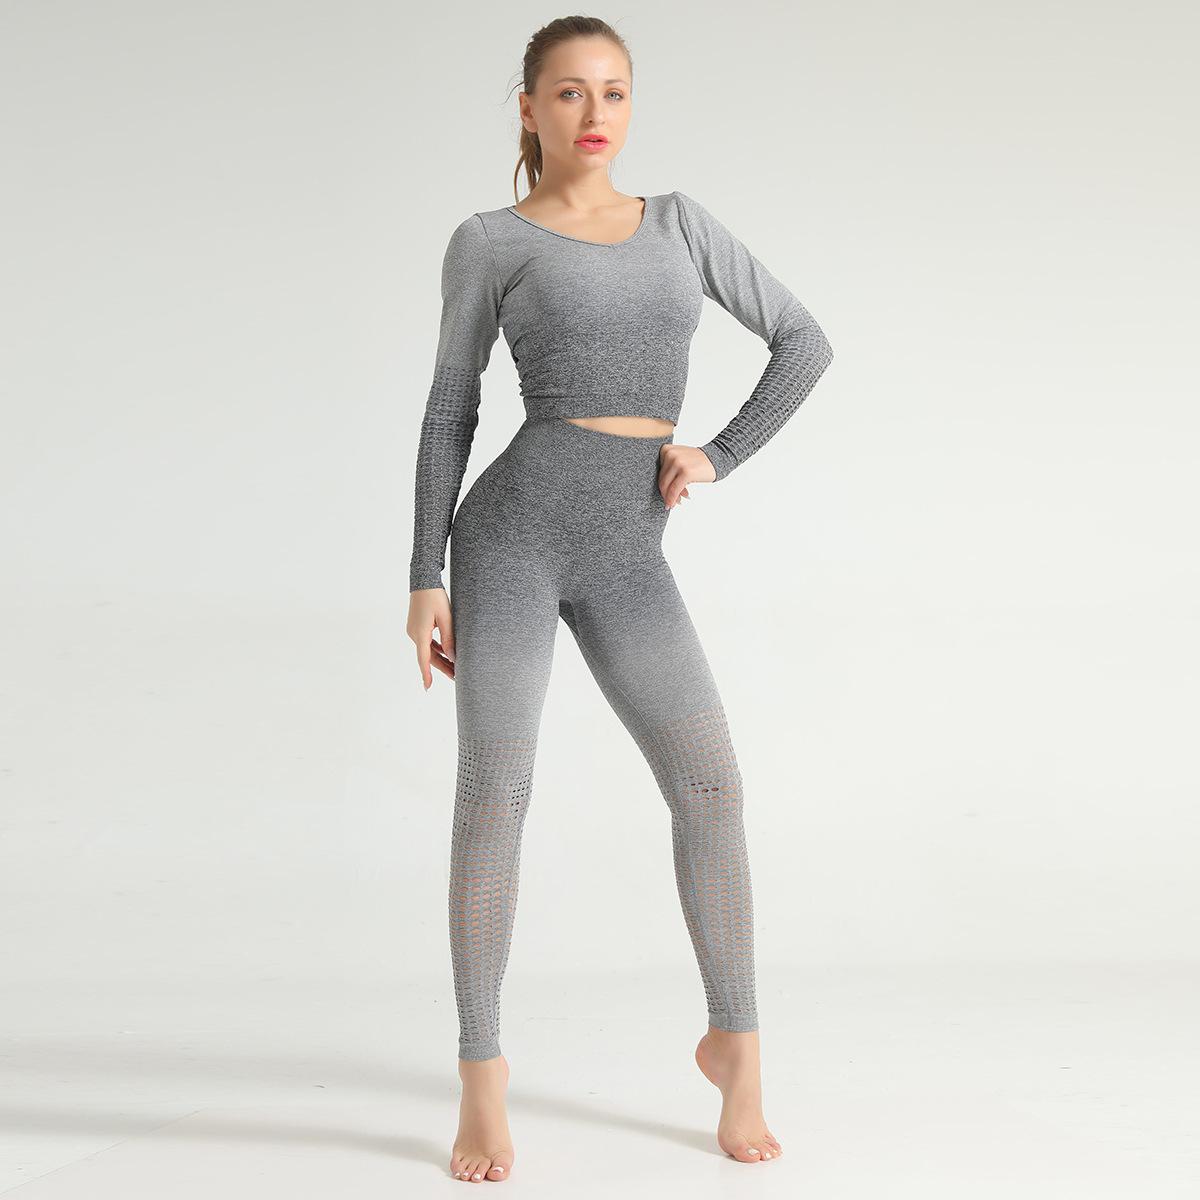 2020 Seamless Gym Leggings Sets High Waist Fitness Clothing Women Embre Yoga Sets 7